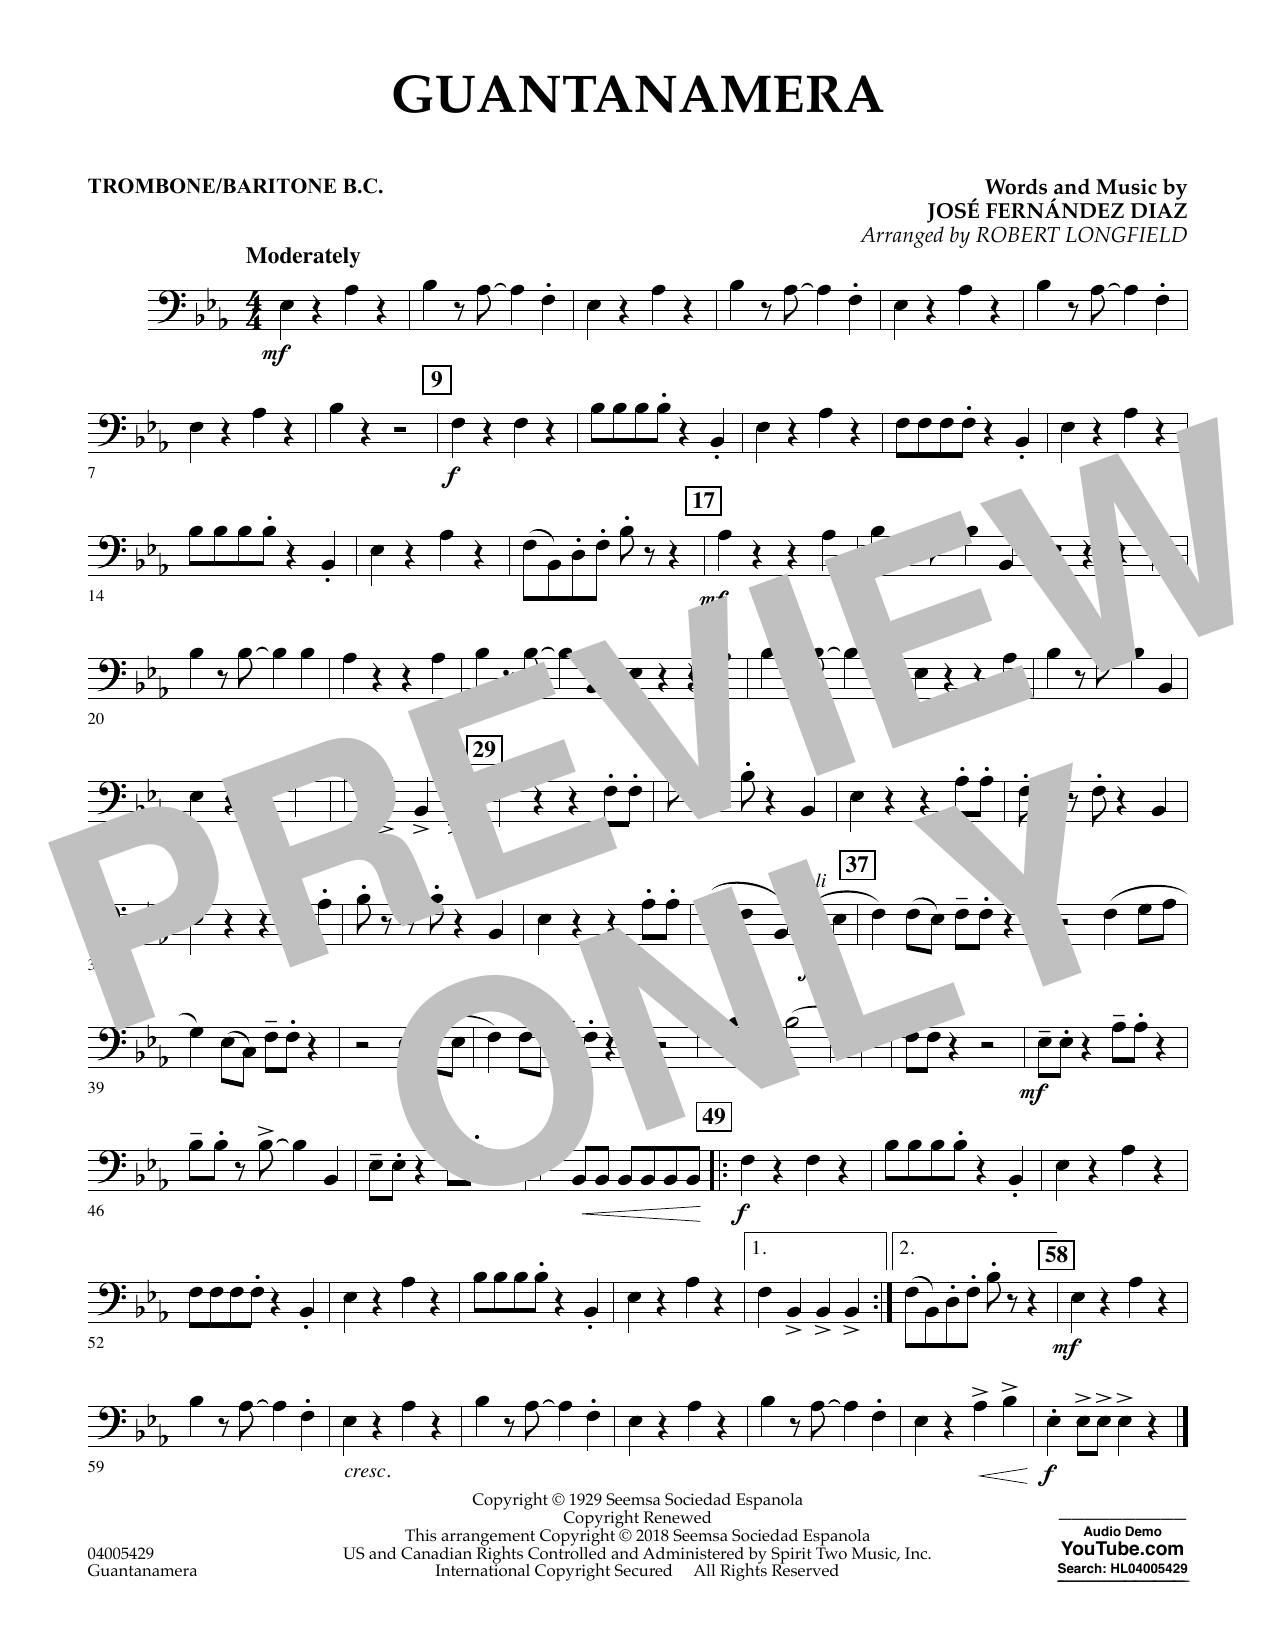 Guantanamera - Trombone/Baritone B.C. (Concert Band)